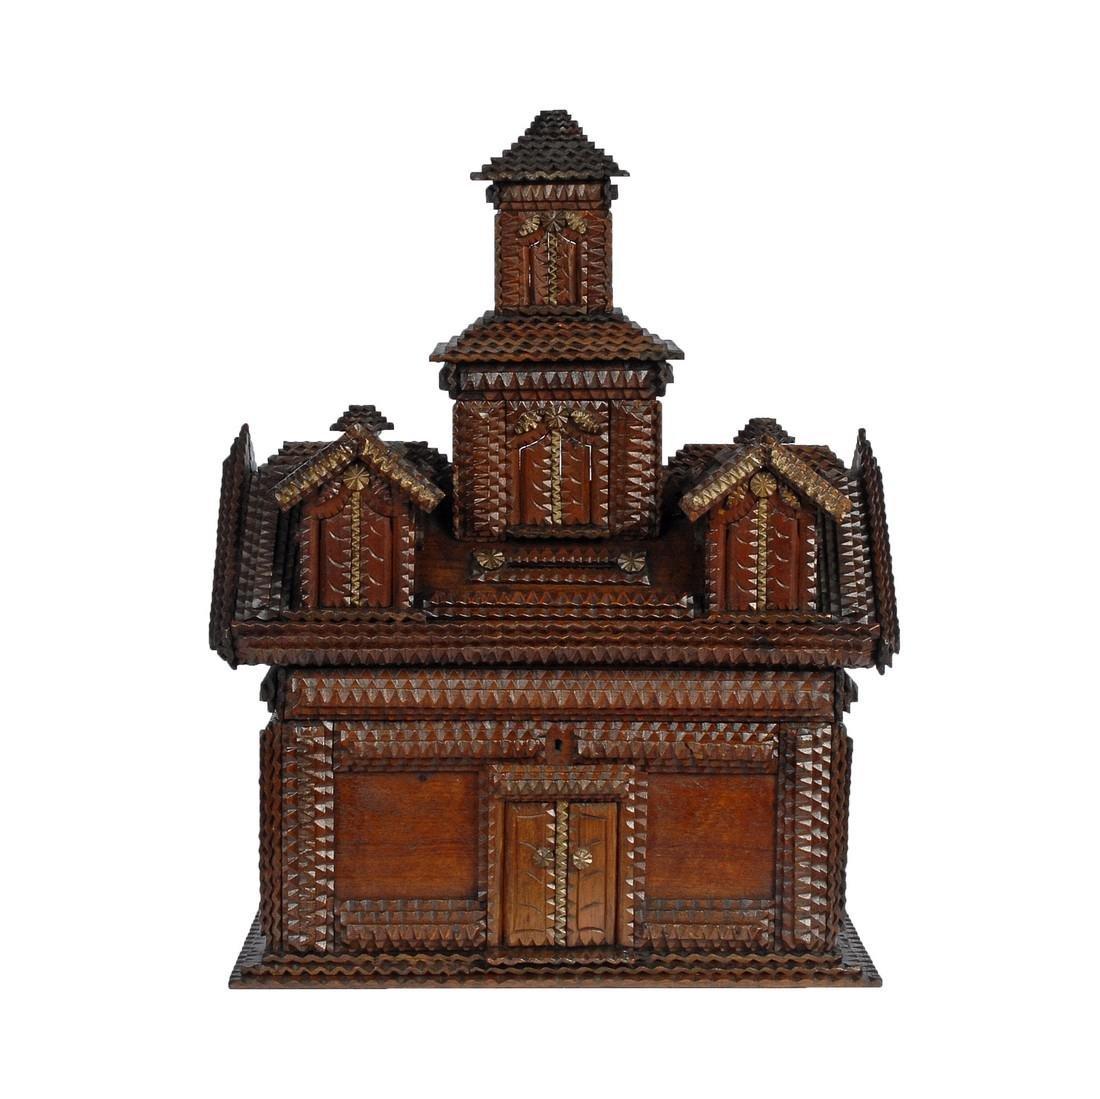 Folk Art Tramp Art House Shaped Box & Tower on Platform - 3